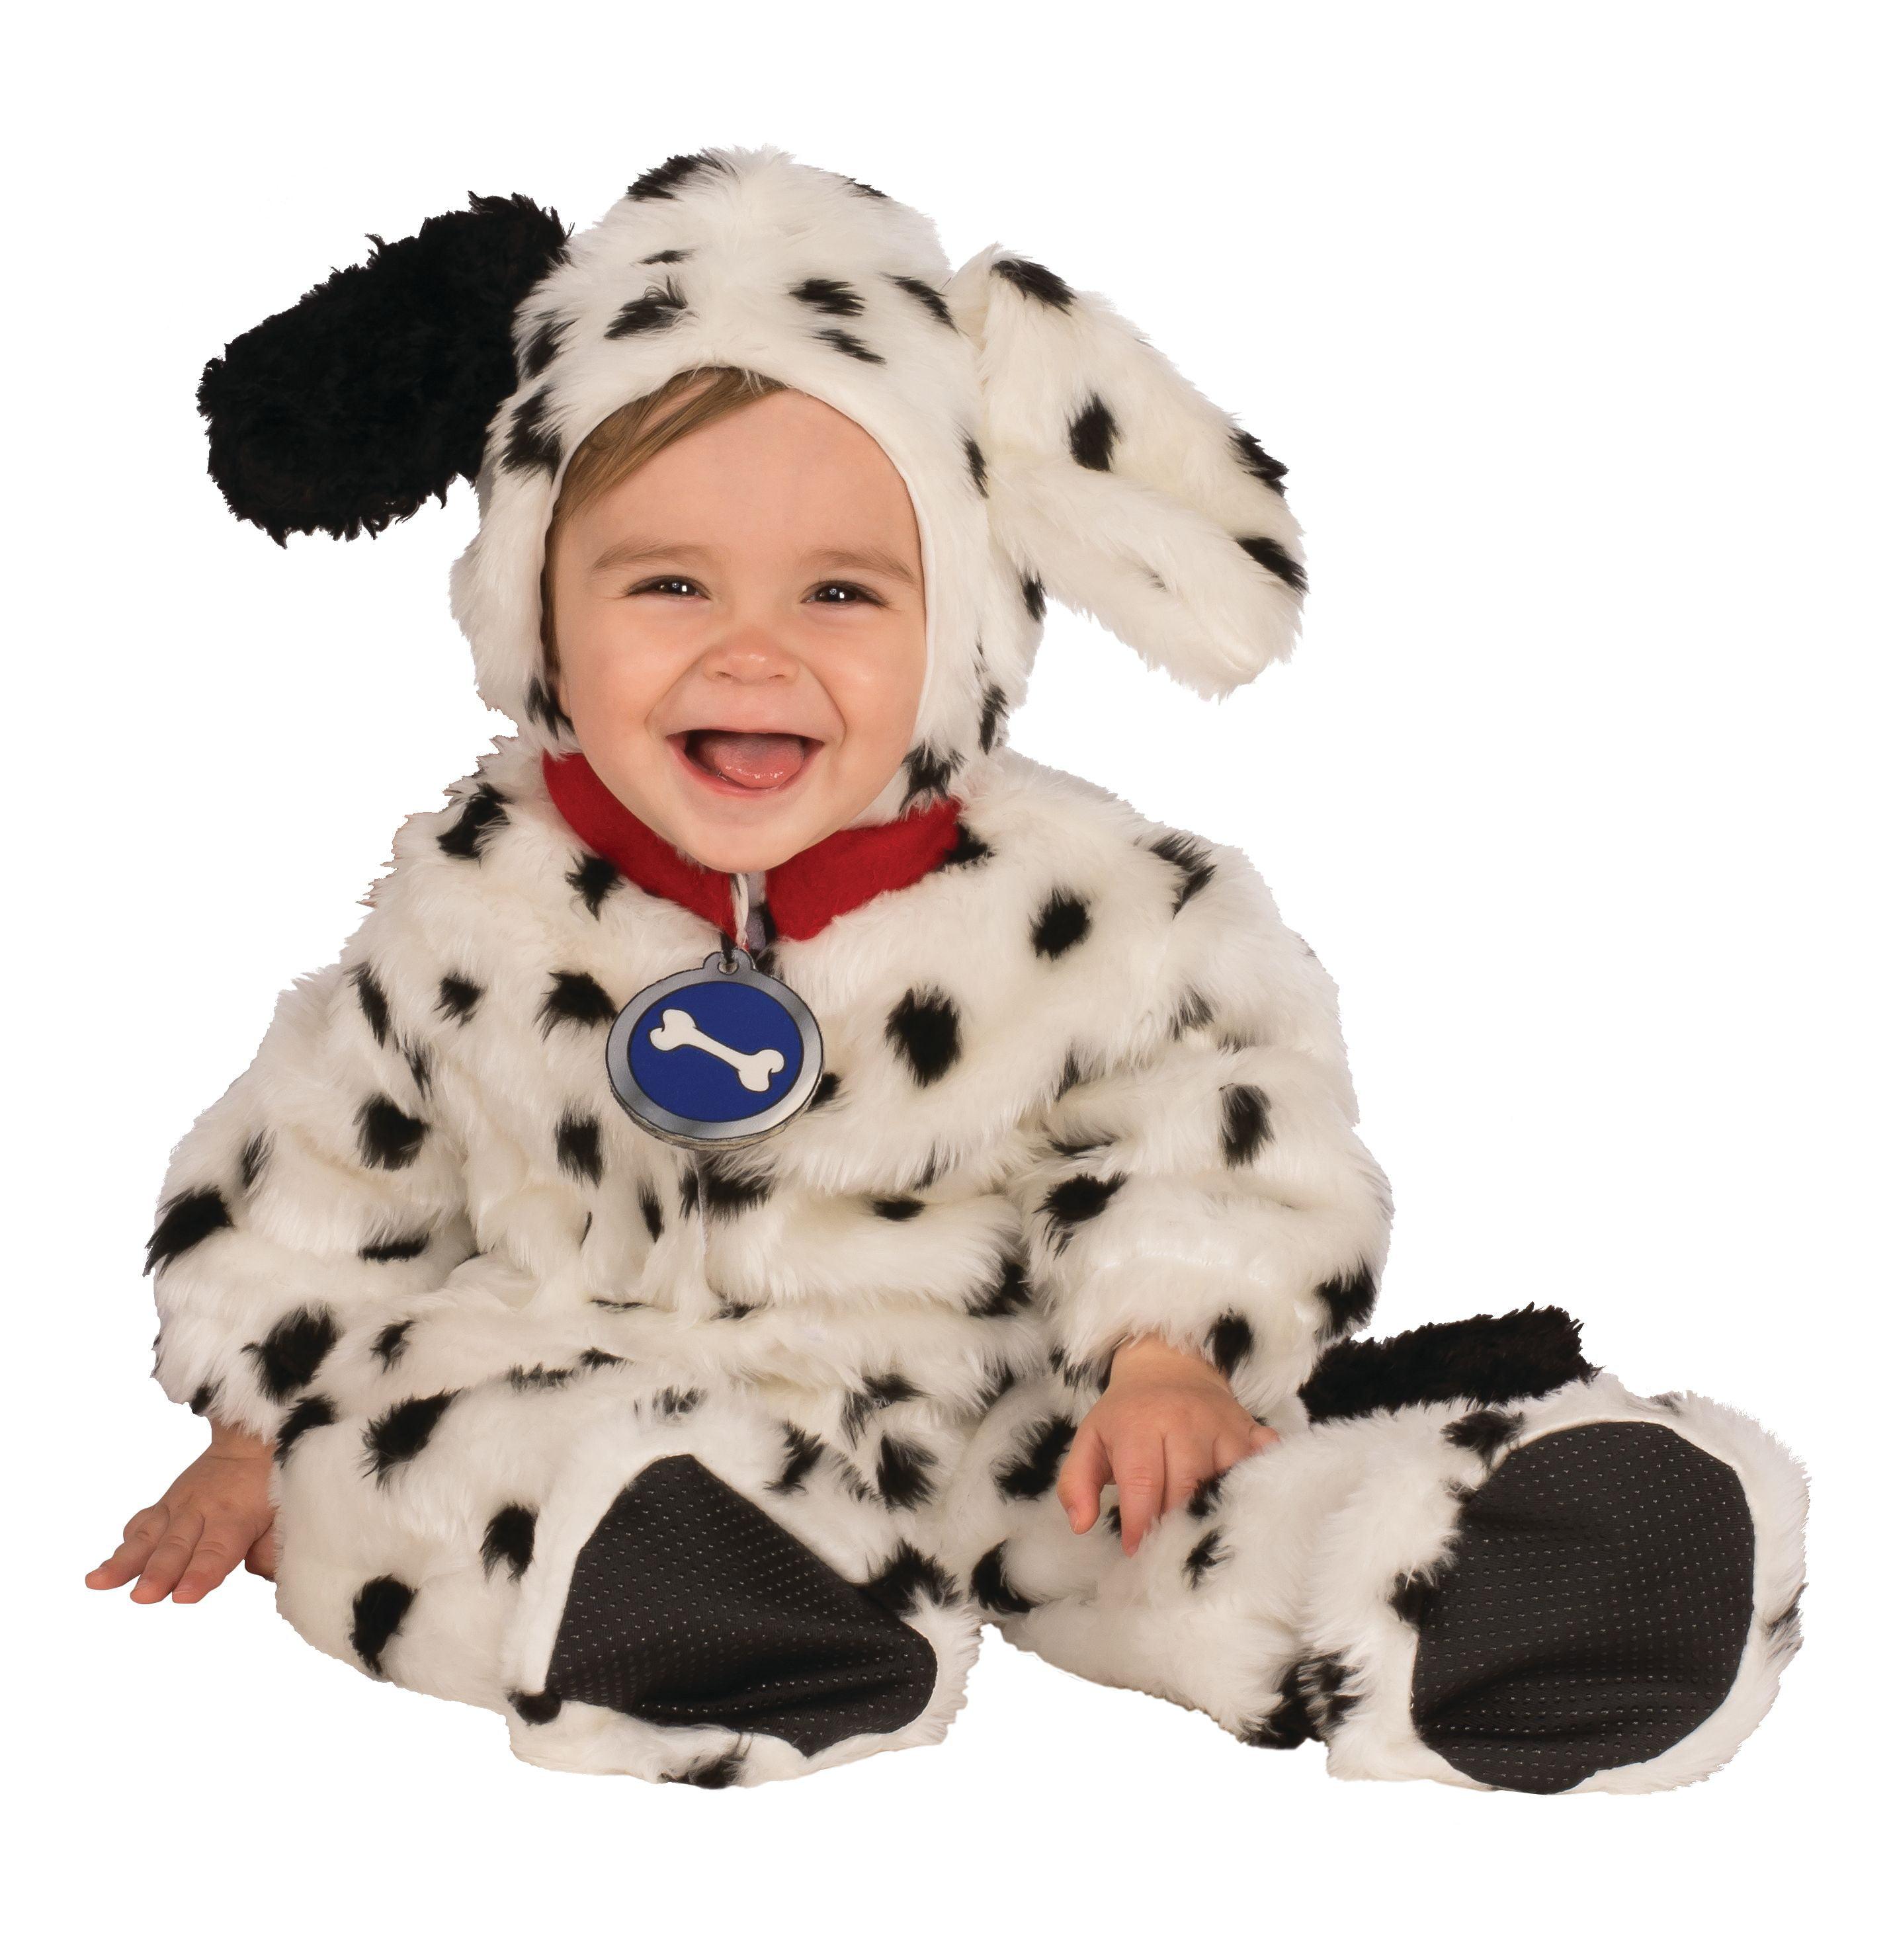 b3b3f1f0b Rubies Costume Co. Dalmatian Infant Halloween Costume - Walmart.com